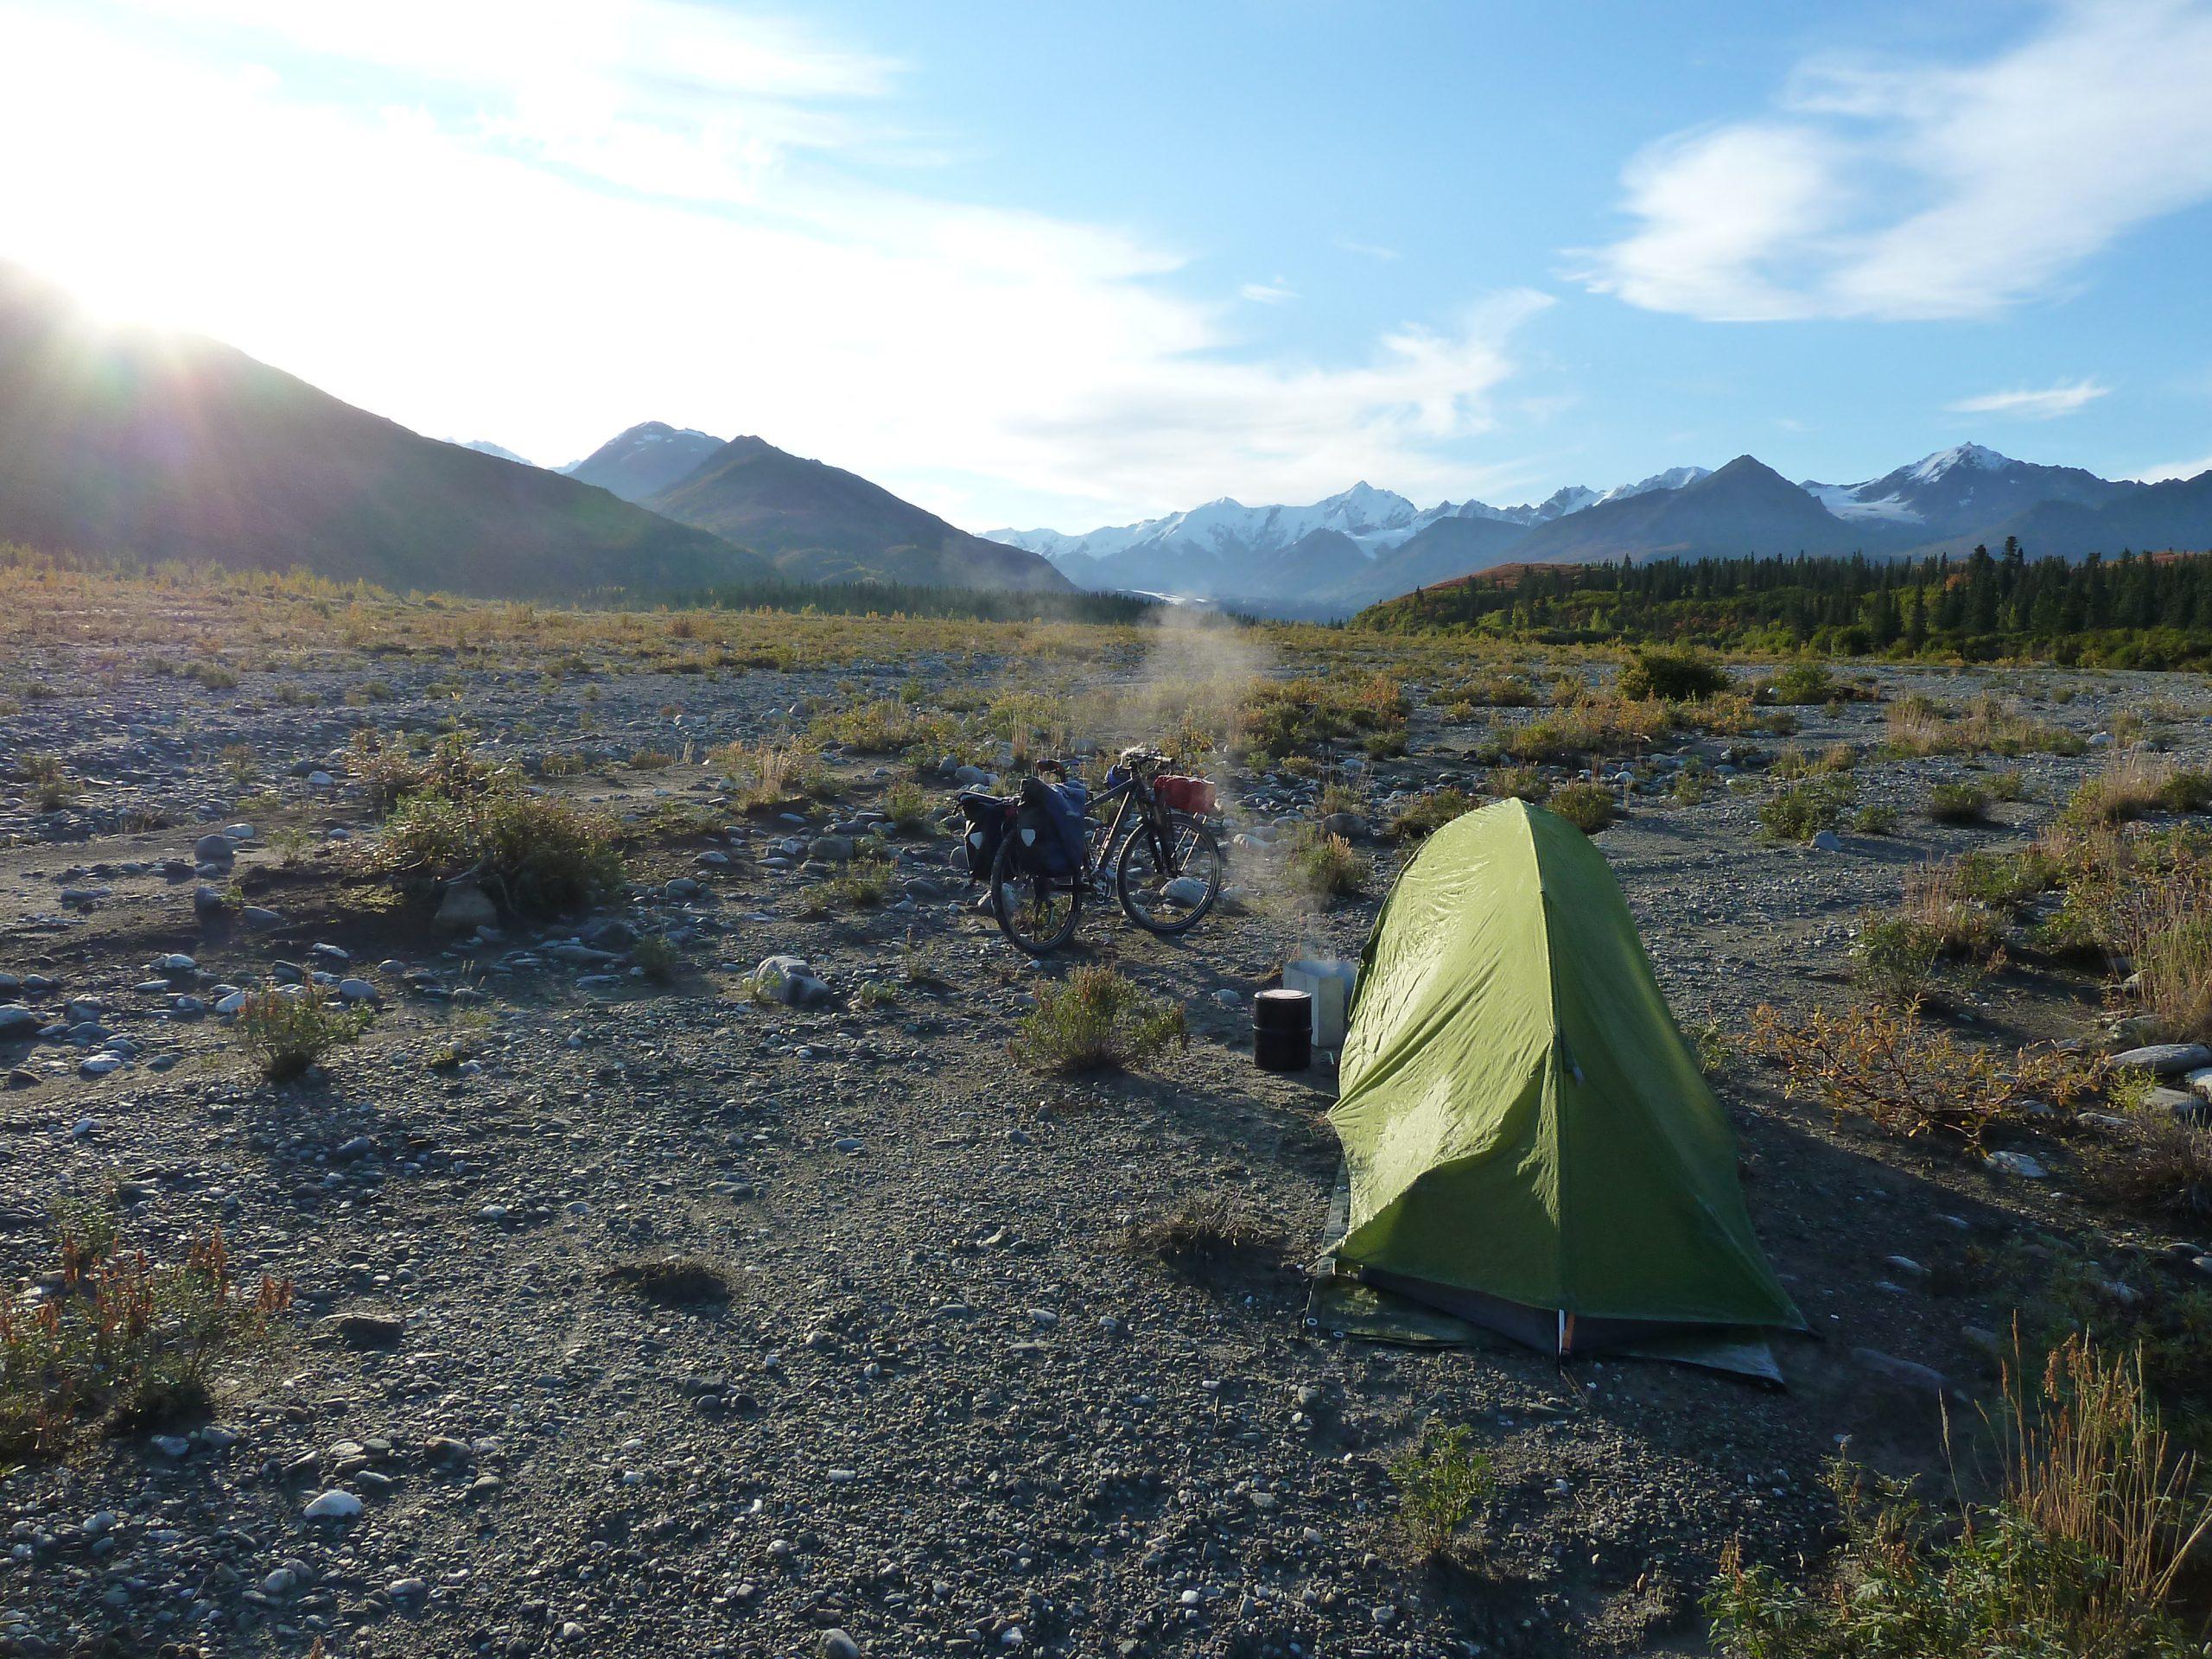 Radreise Alaska 2010 - Zeltplatz am Gletscherfluß - Castner Glacier